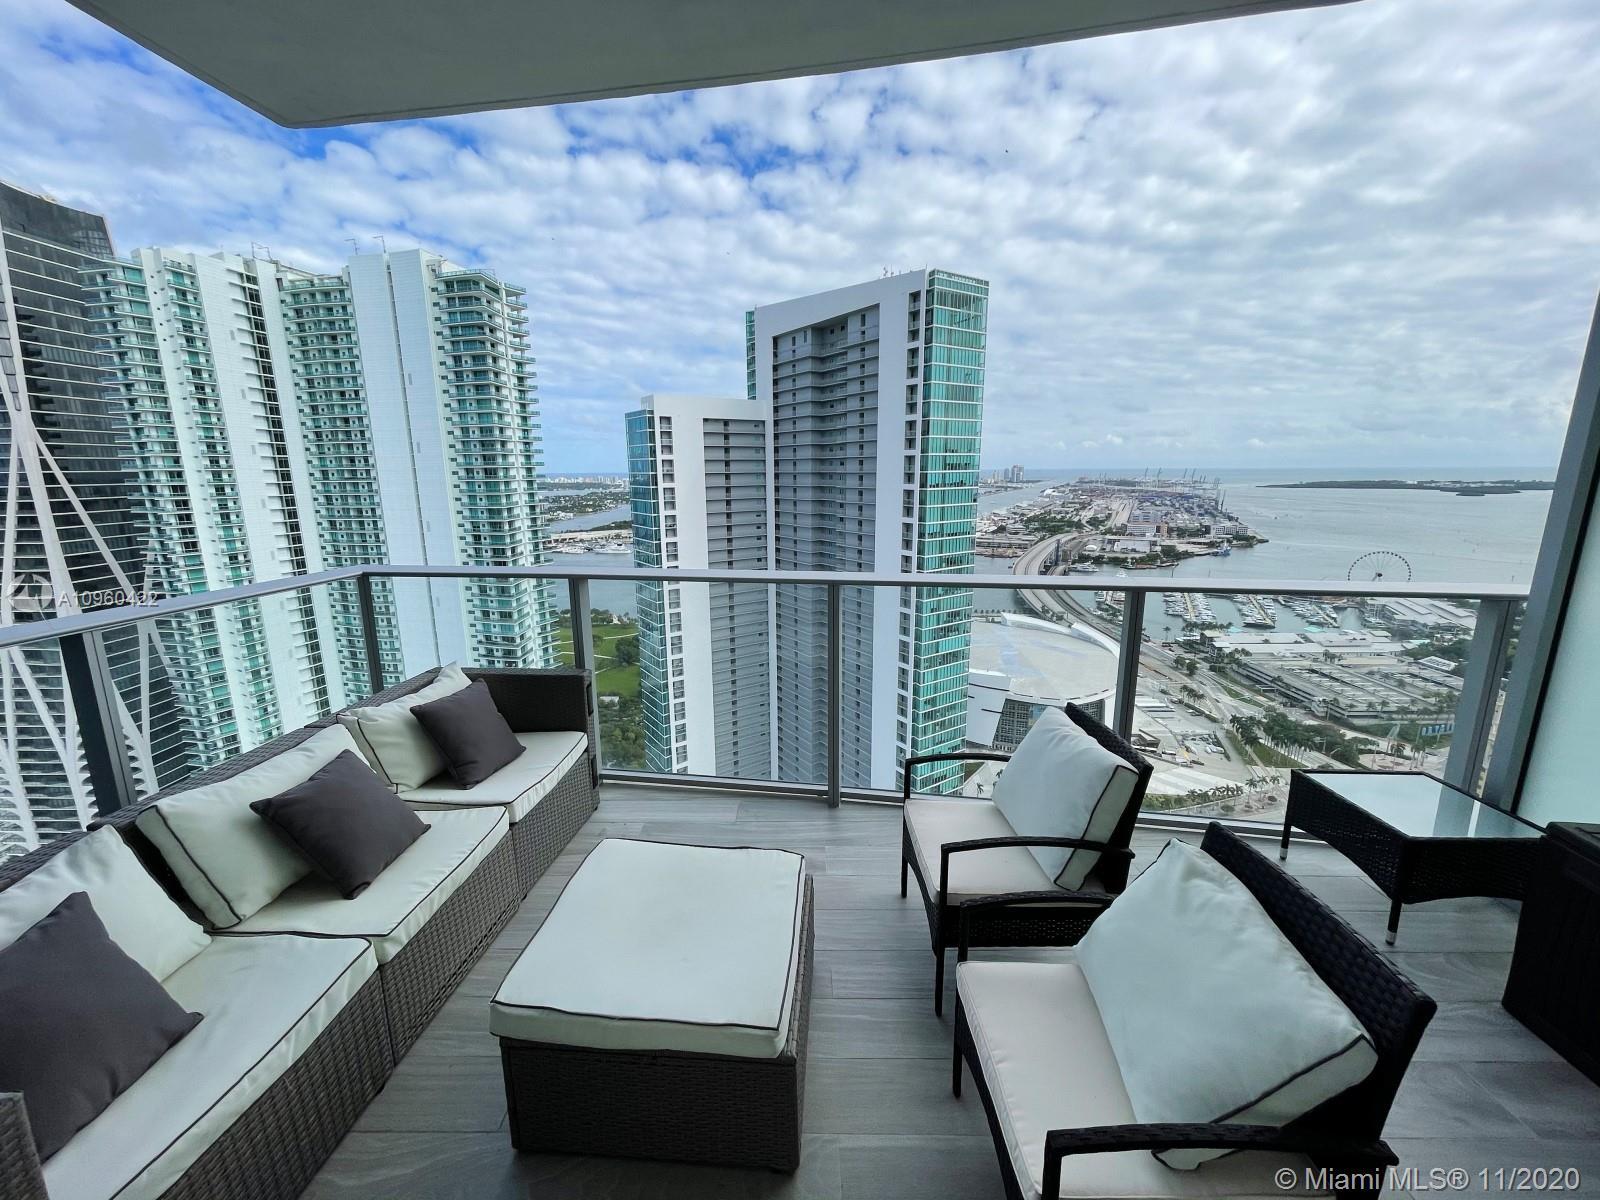 Paramount Miami Worldcenter #4307 - 851 NE 1st Ave #4307, Miami, FL 33132